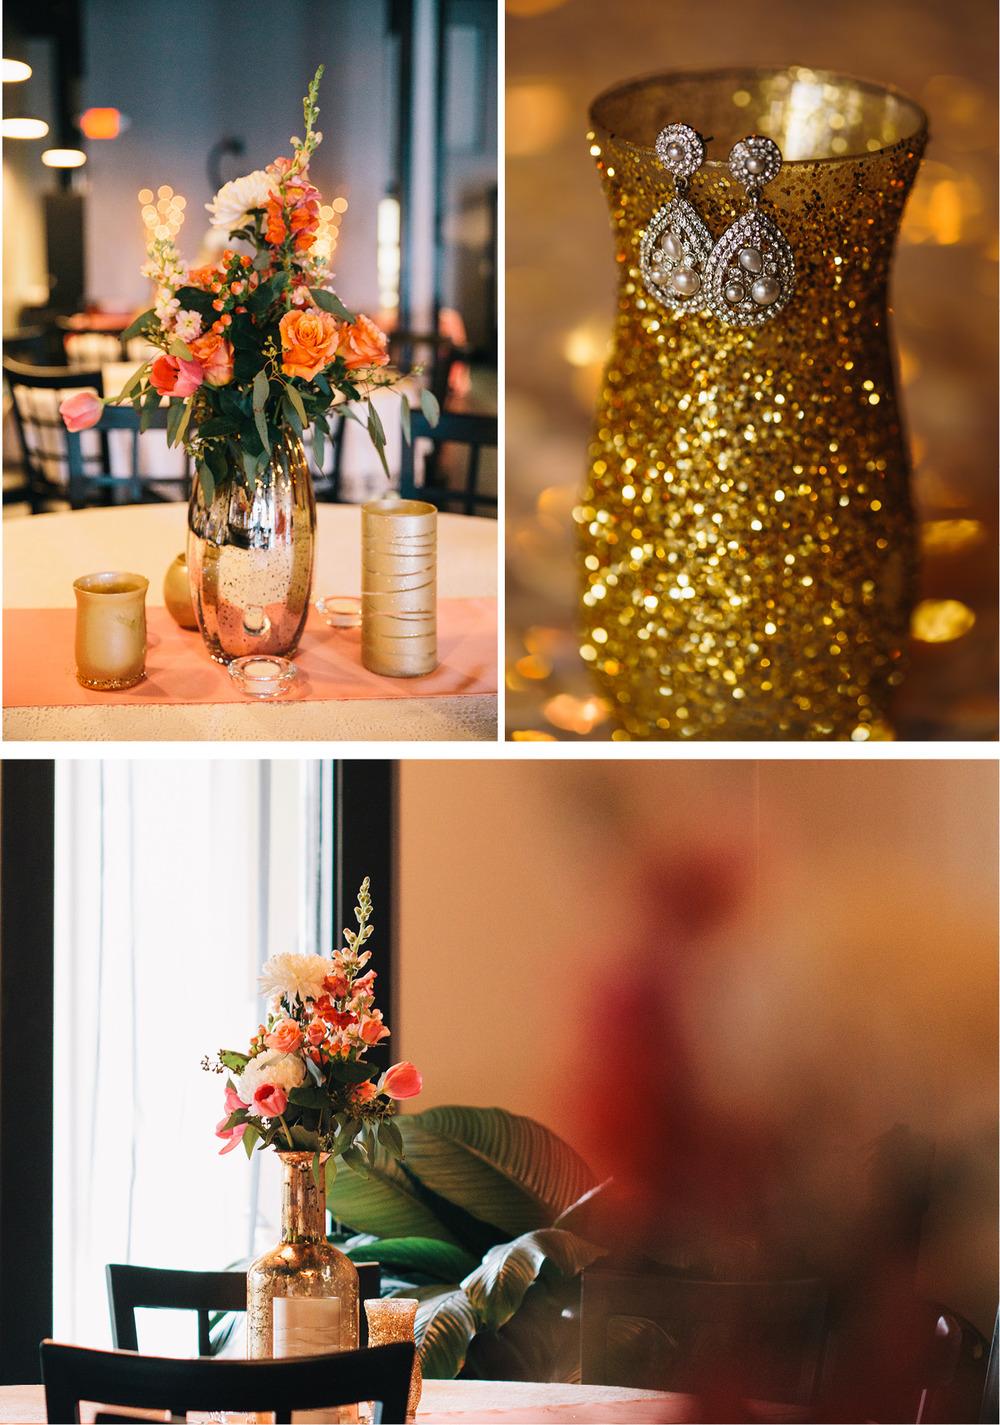 CK-Photo-Nashville-wedding-photography-bd2.jpg